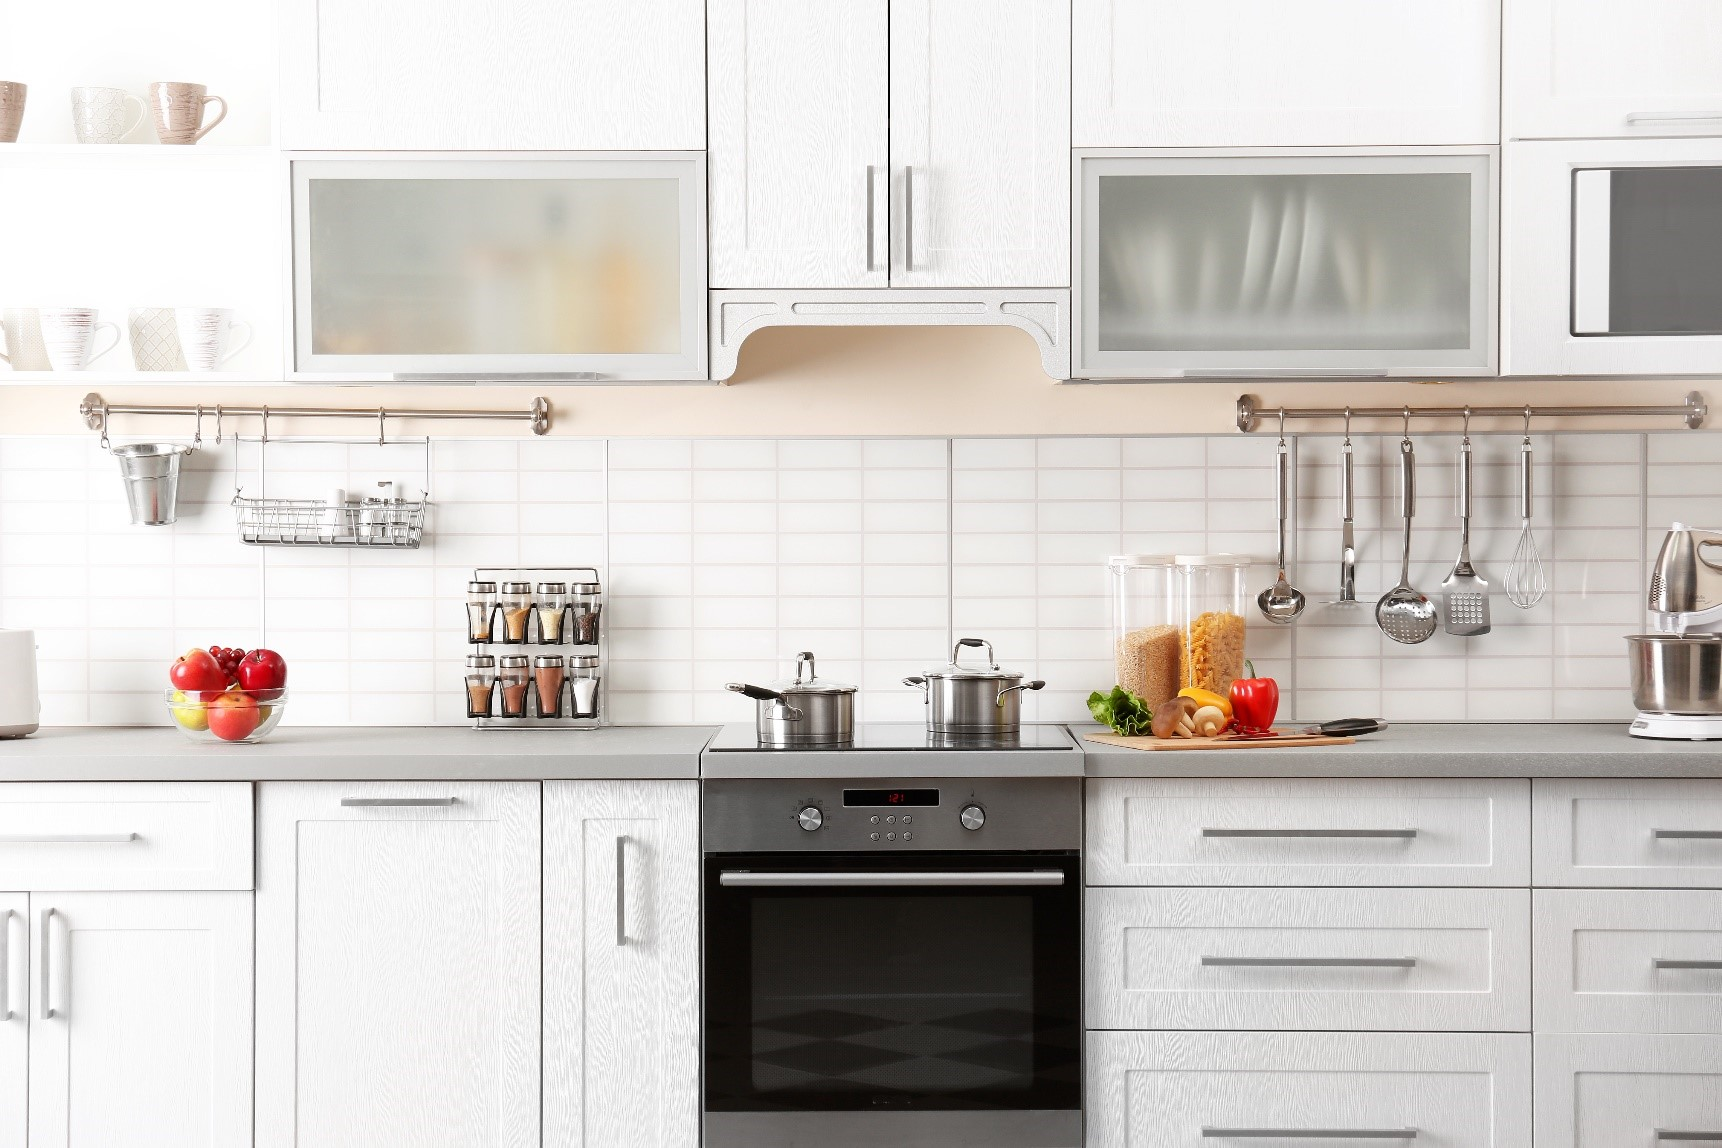 Welke keukenapparatuur heb je nodig? #keuken #keukenapparatuur